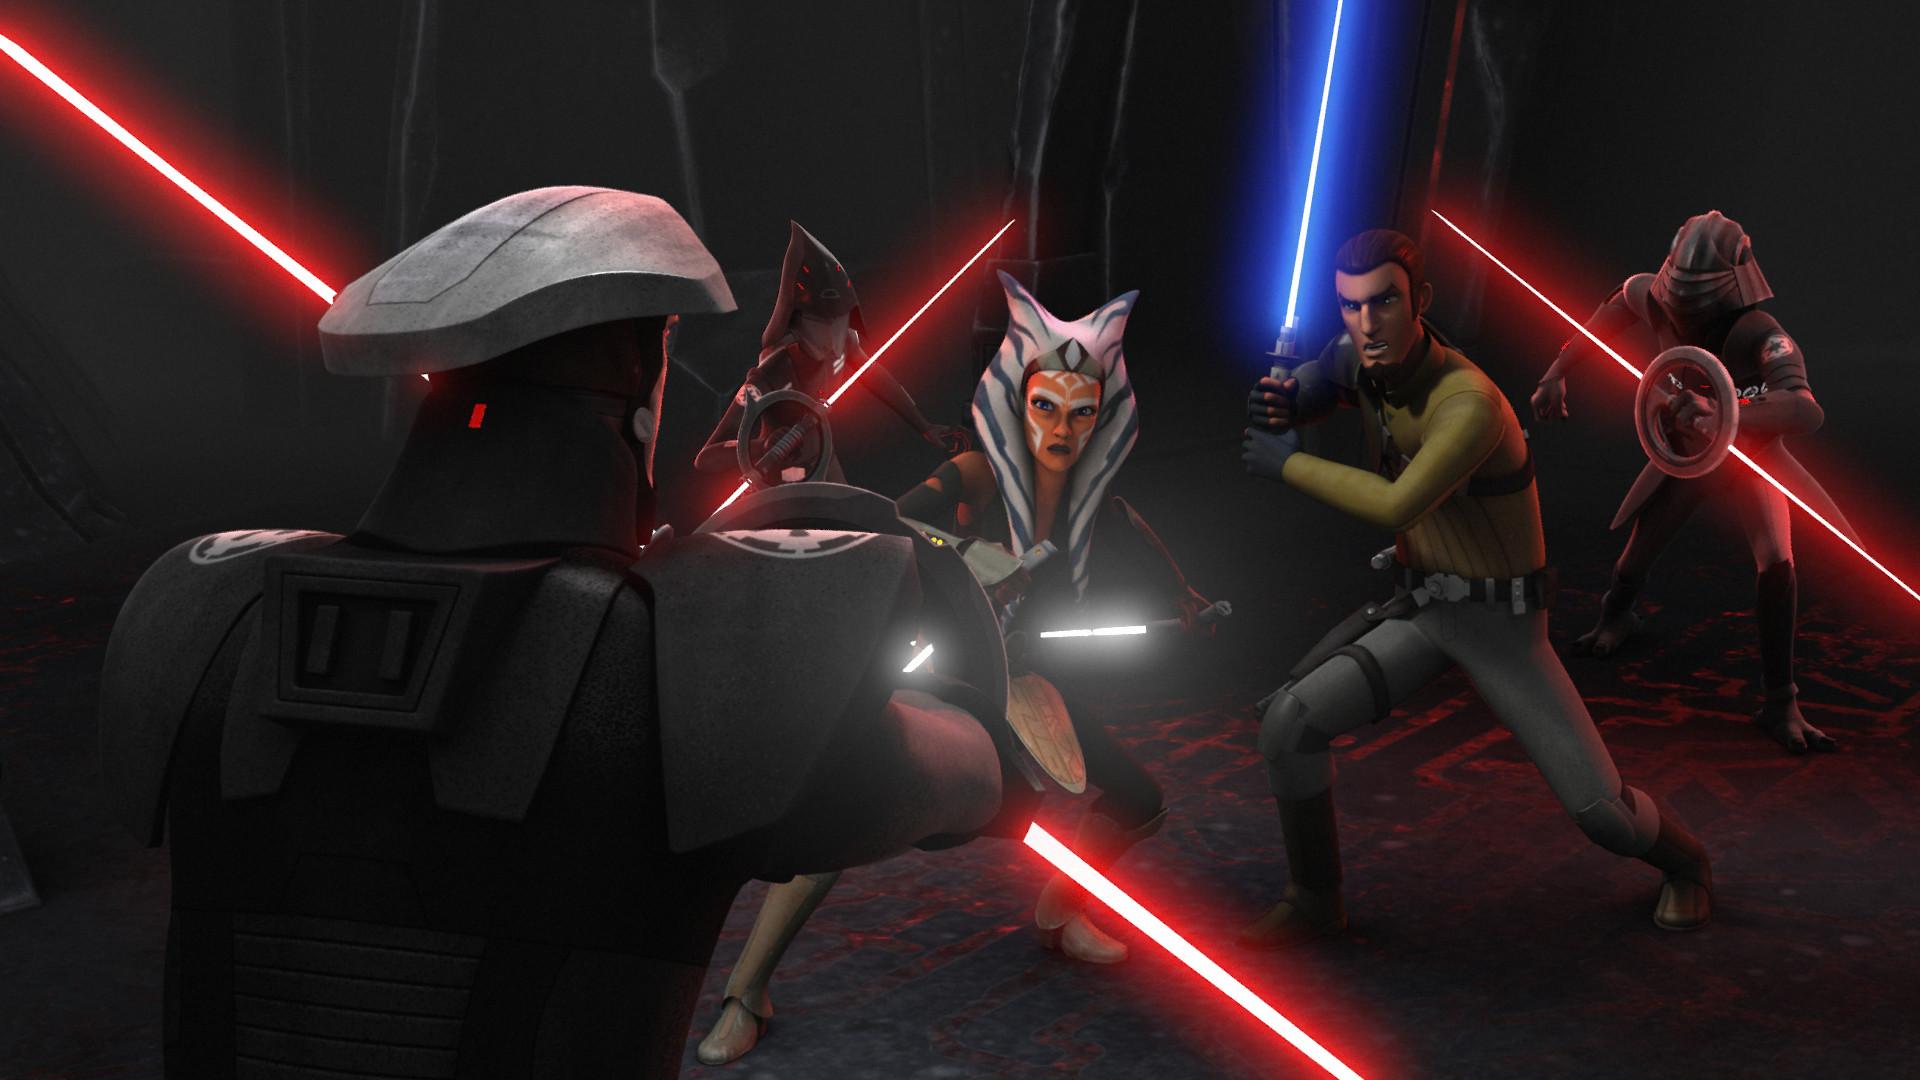 STAR WARS REBELS Season 2 Finale Recap: Ahsoka Confronts Darth Vader |  Nerdist